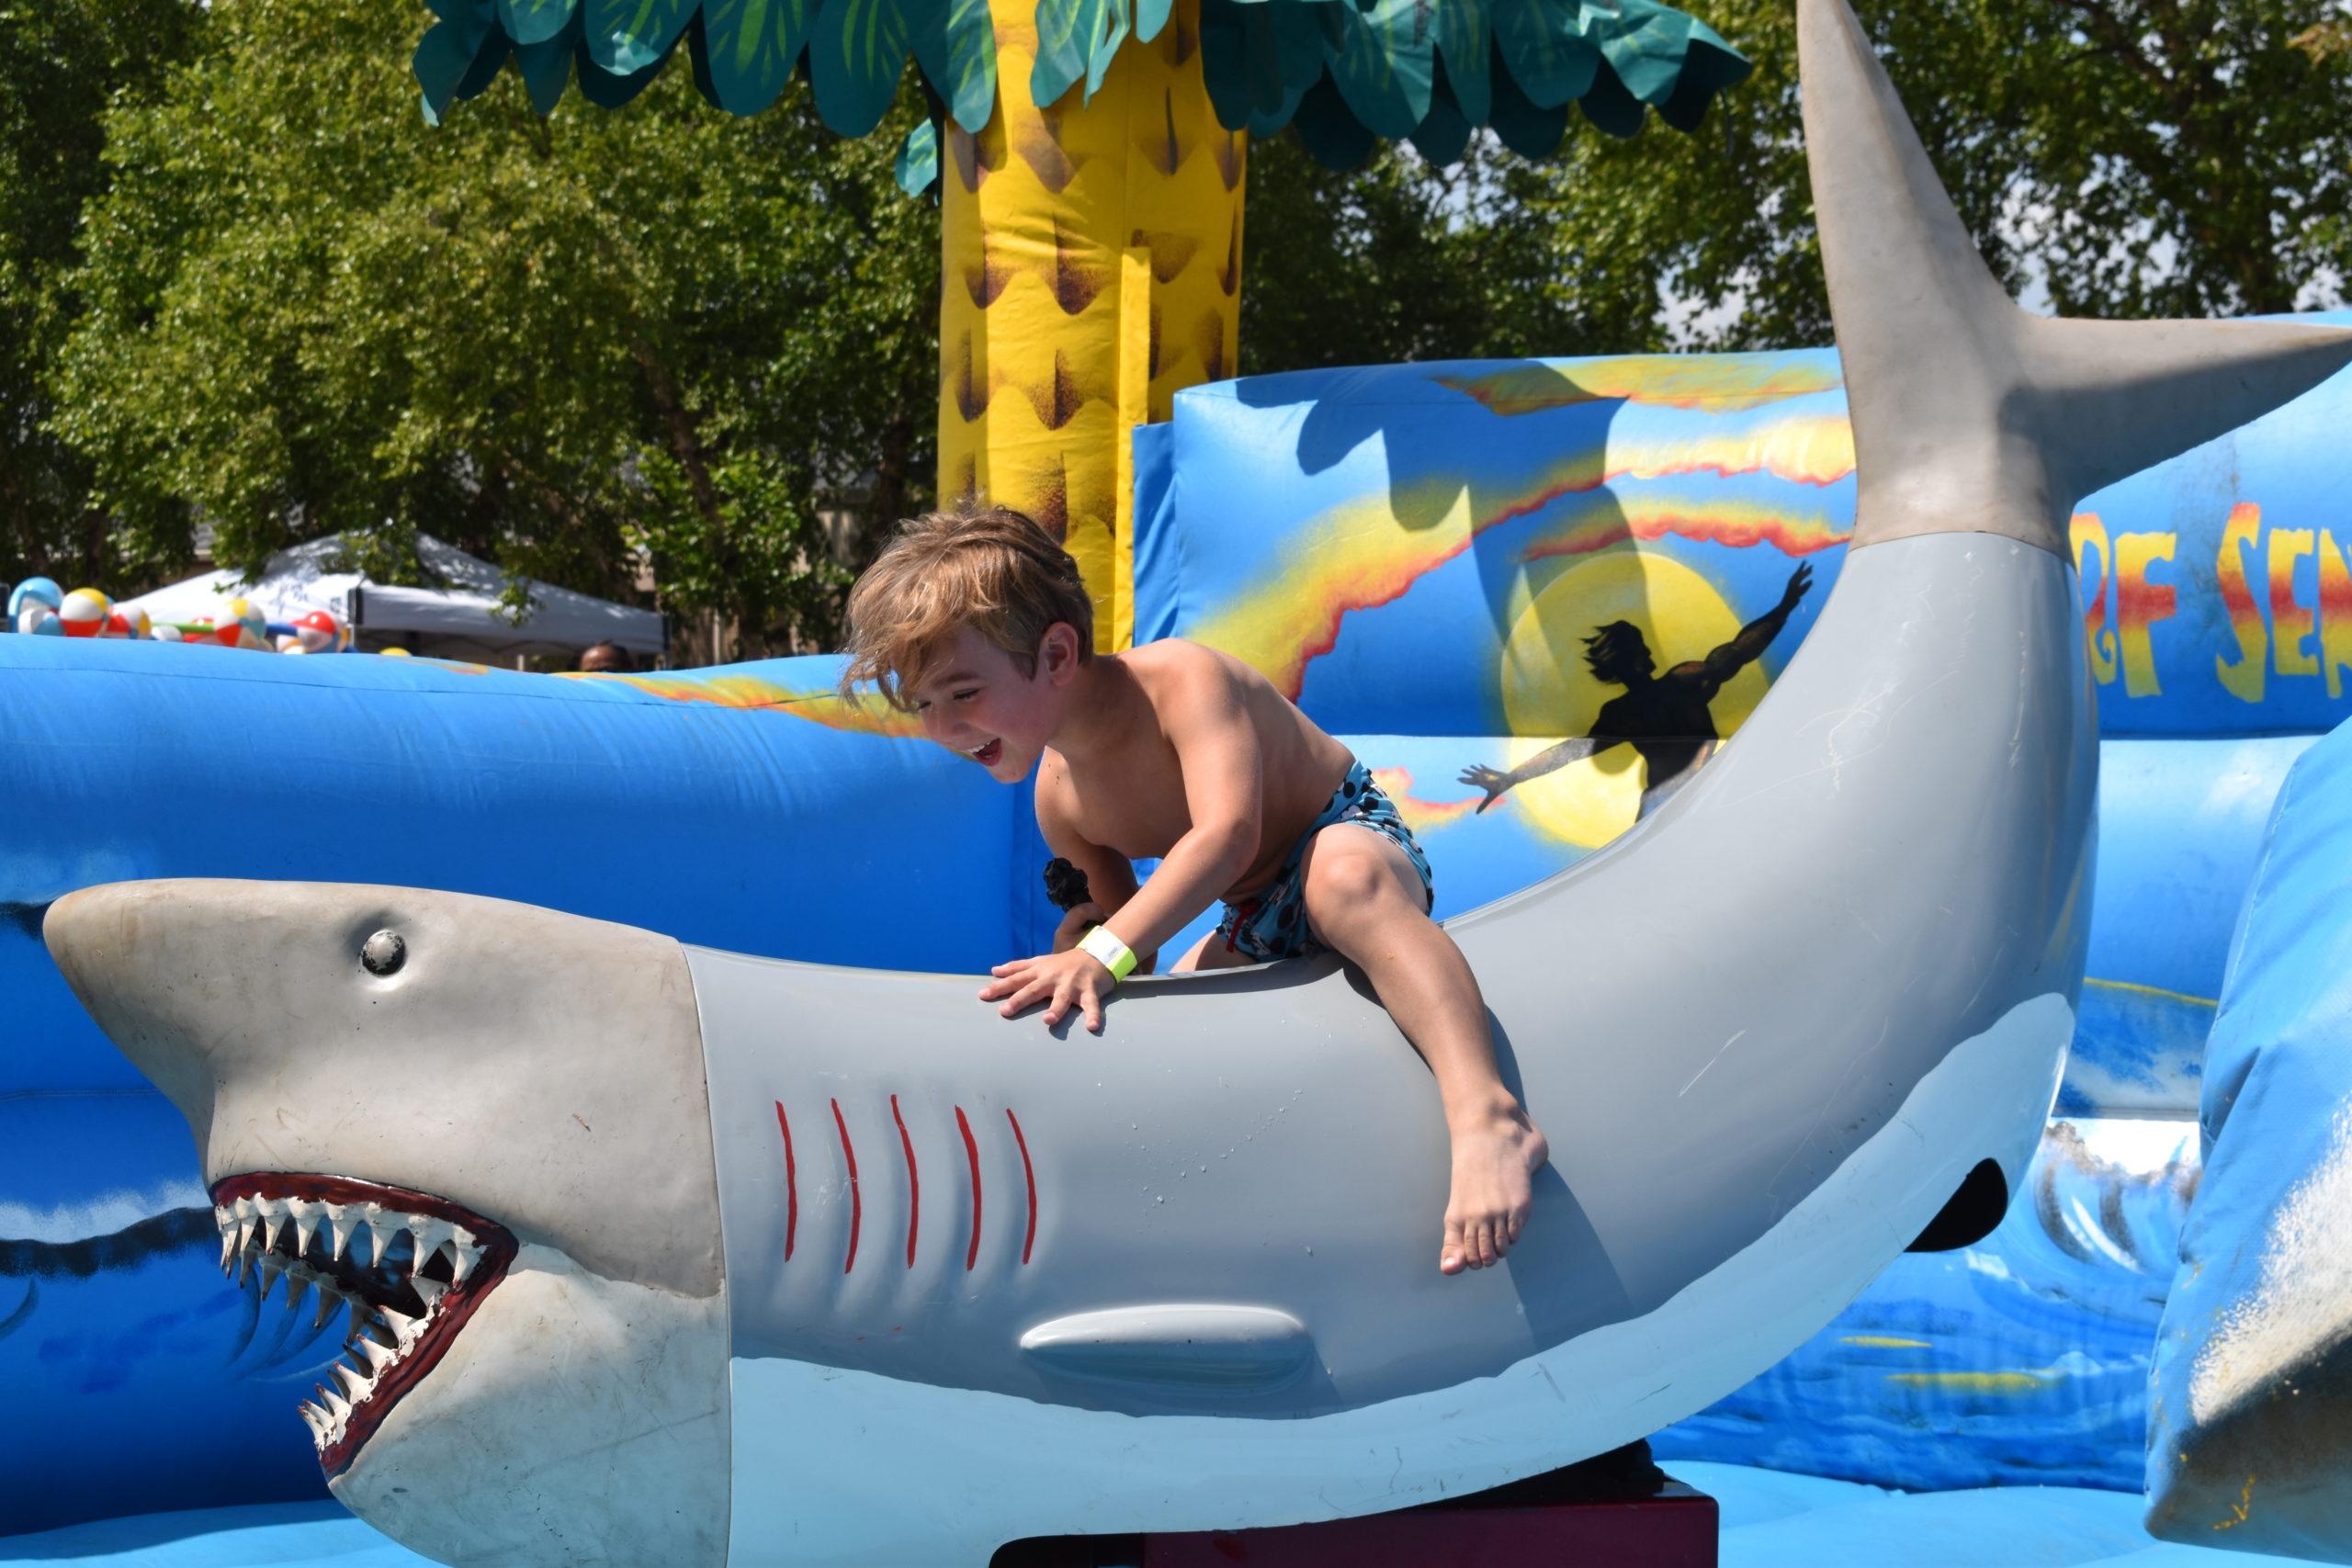 BOY ON MECHANICAL SHARK